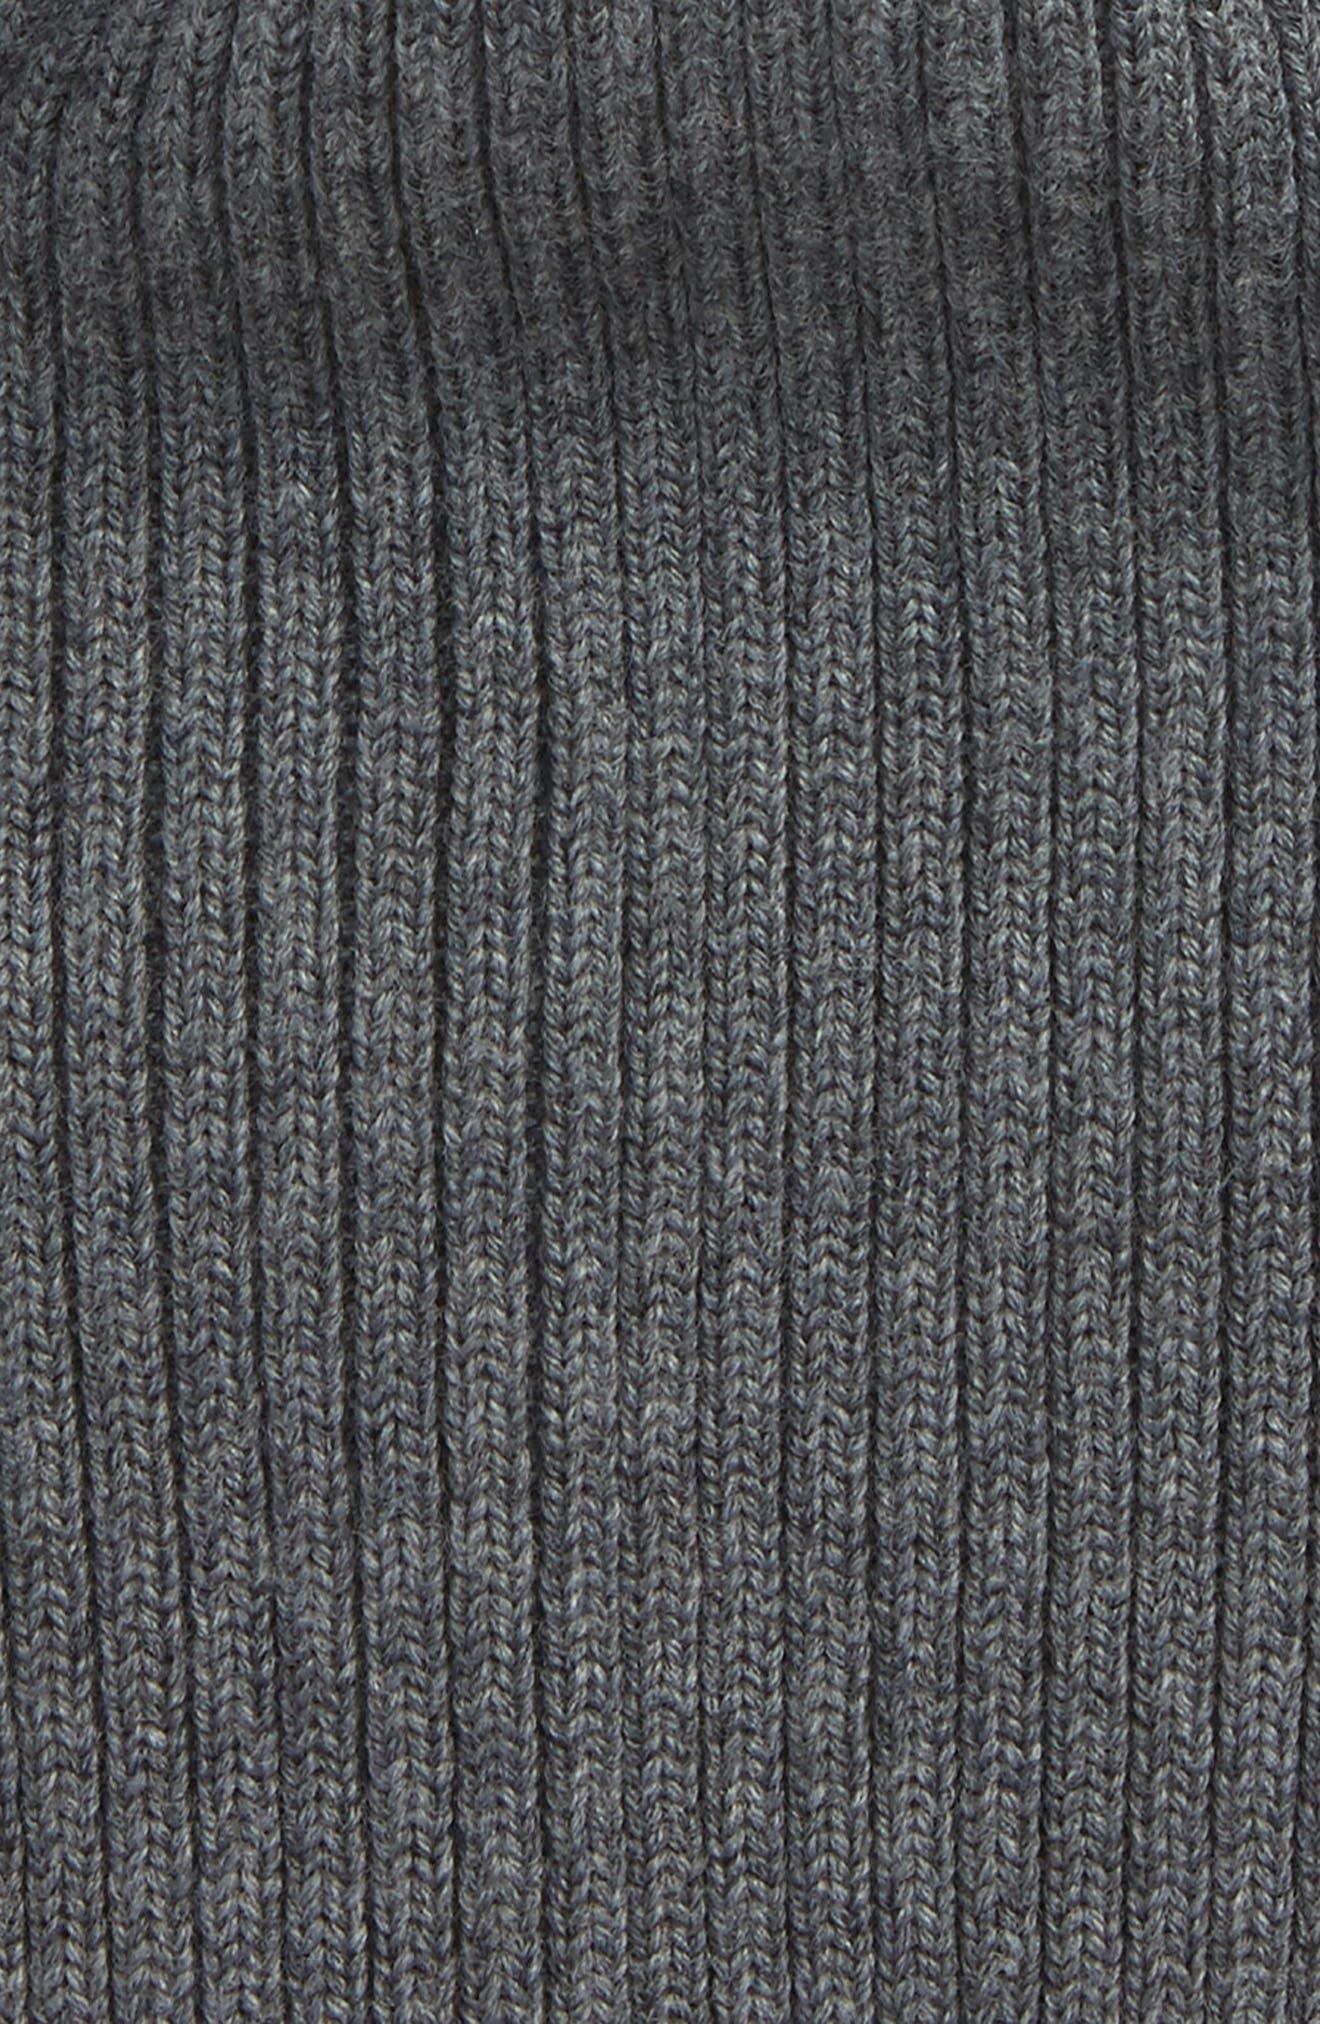 Rib Knit Wool Beanie,                             Alternate thumbnail 2, color,                             032